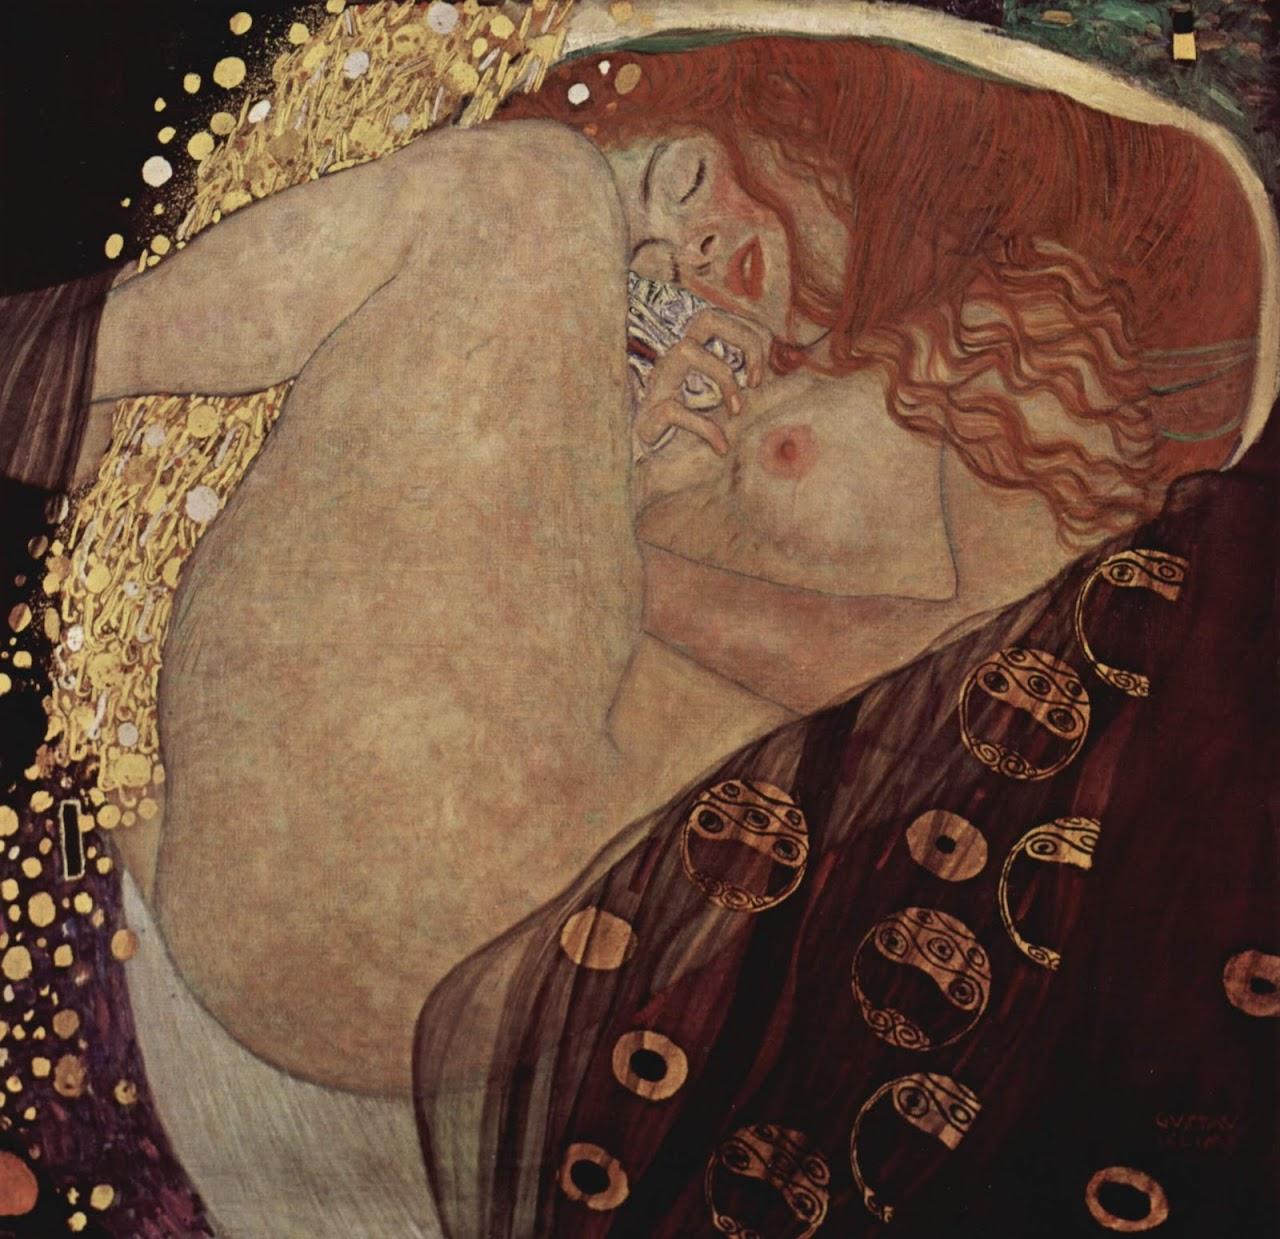 http://1.bp.blogspot.com/-zC9a0zPsIP8/TZUwVMHRm3I/AAAAAAAAB68/taHb29B3a_4/s1280/Gustav_Klimt+Danae.jpg